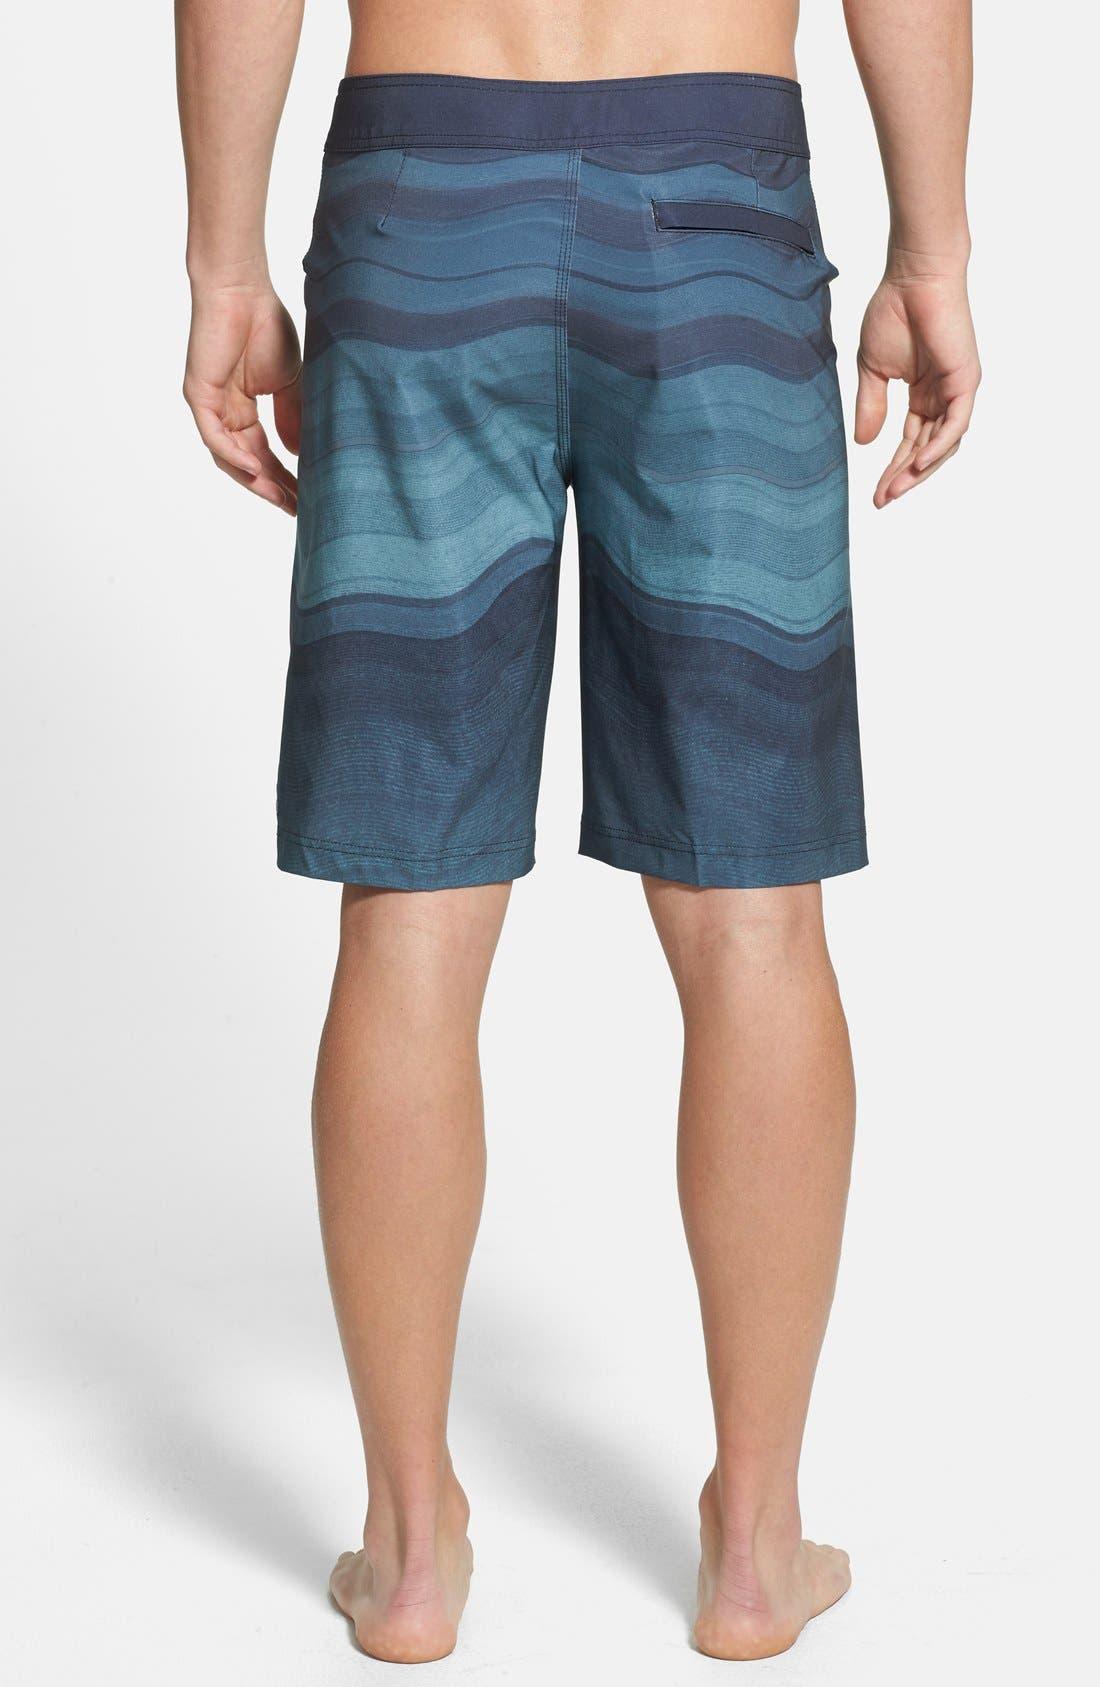 'Sediment' Stretch Board Shorts,                             Alternate thumbnail 41, color,